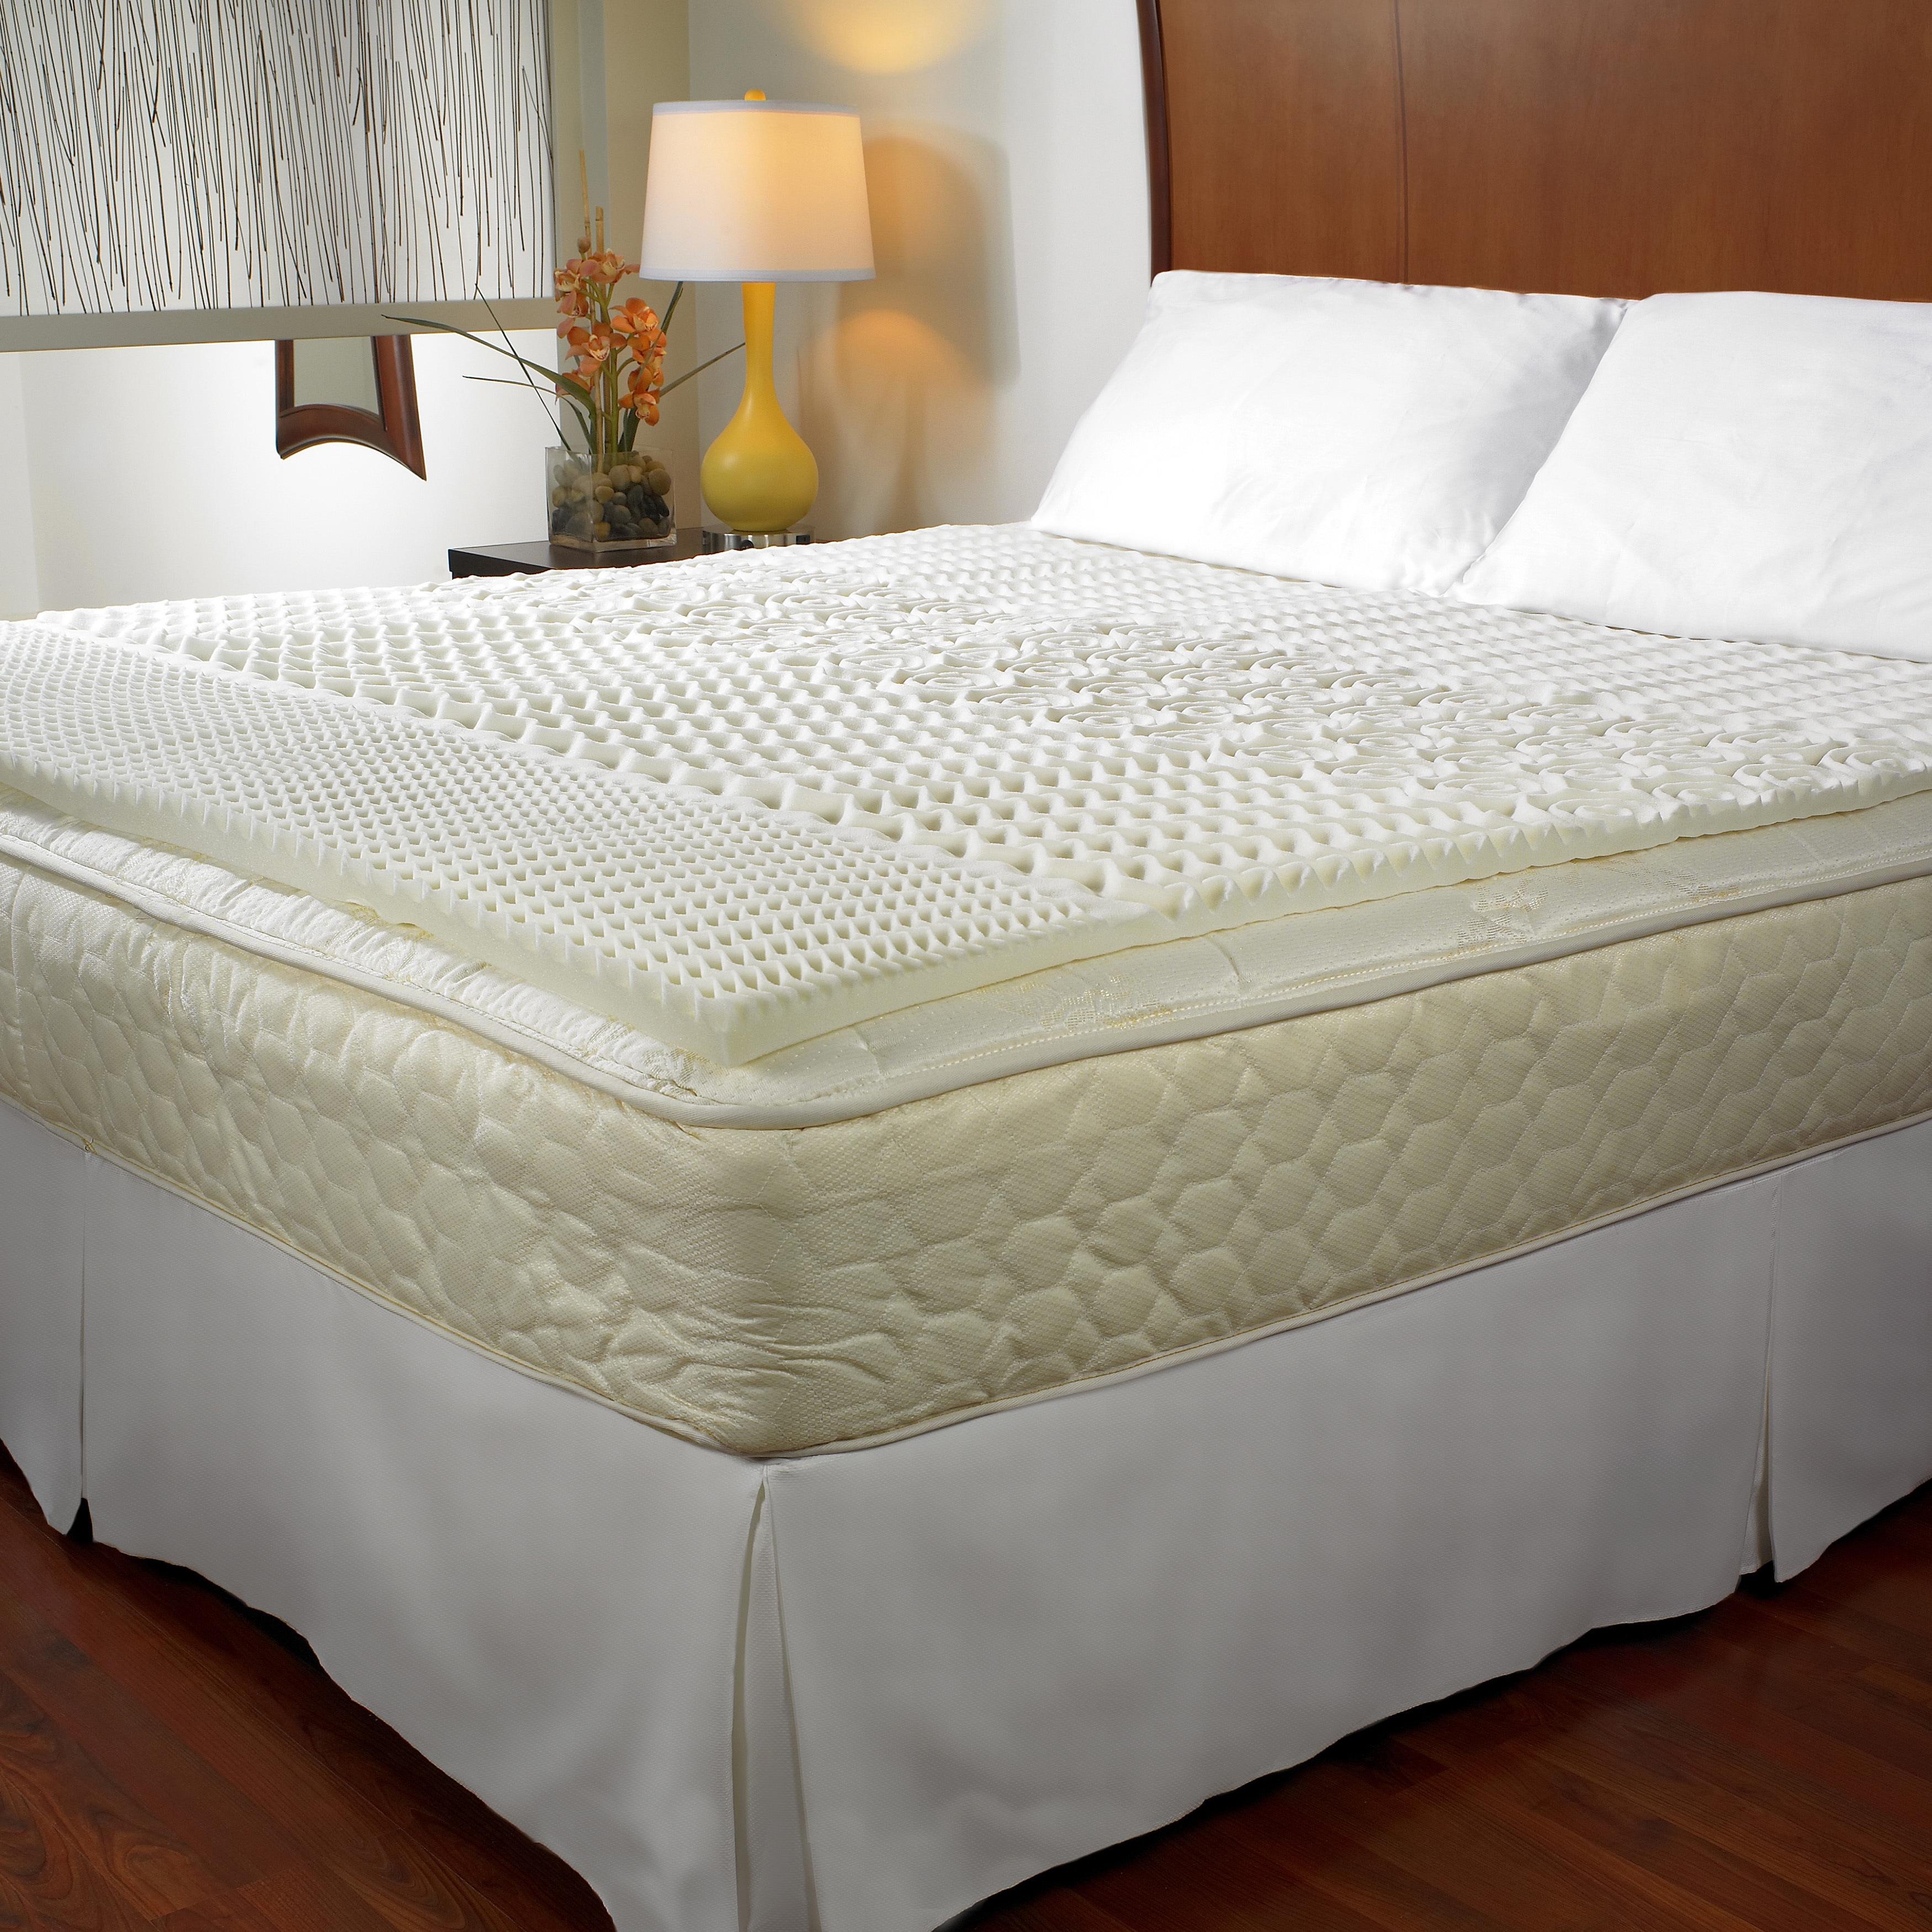 online store 2a00e 6914c Convoluted 5-zone 1.5-inch Memory Foam Mattress Topper